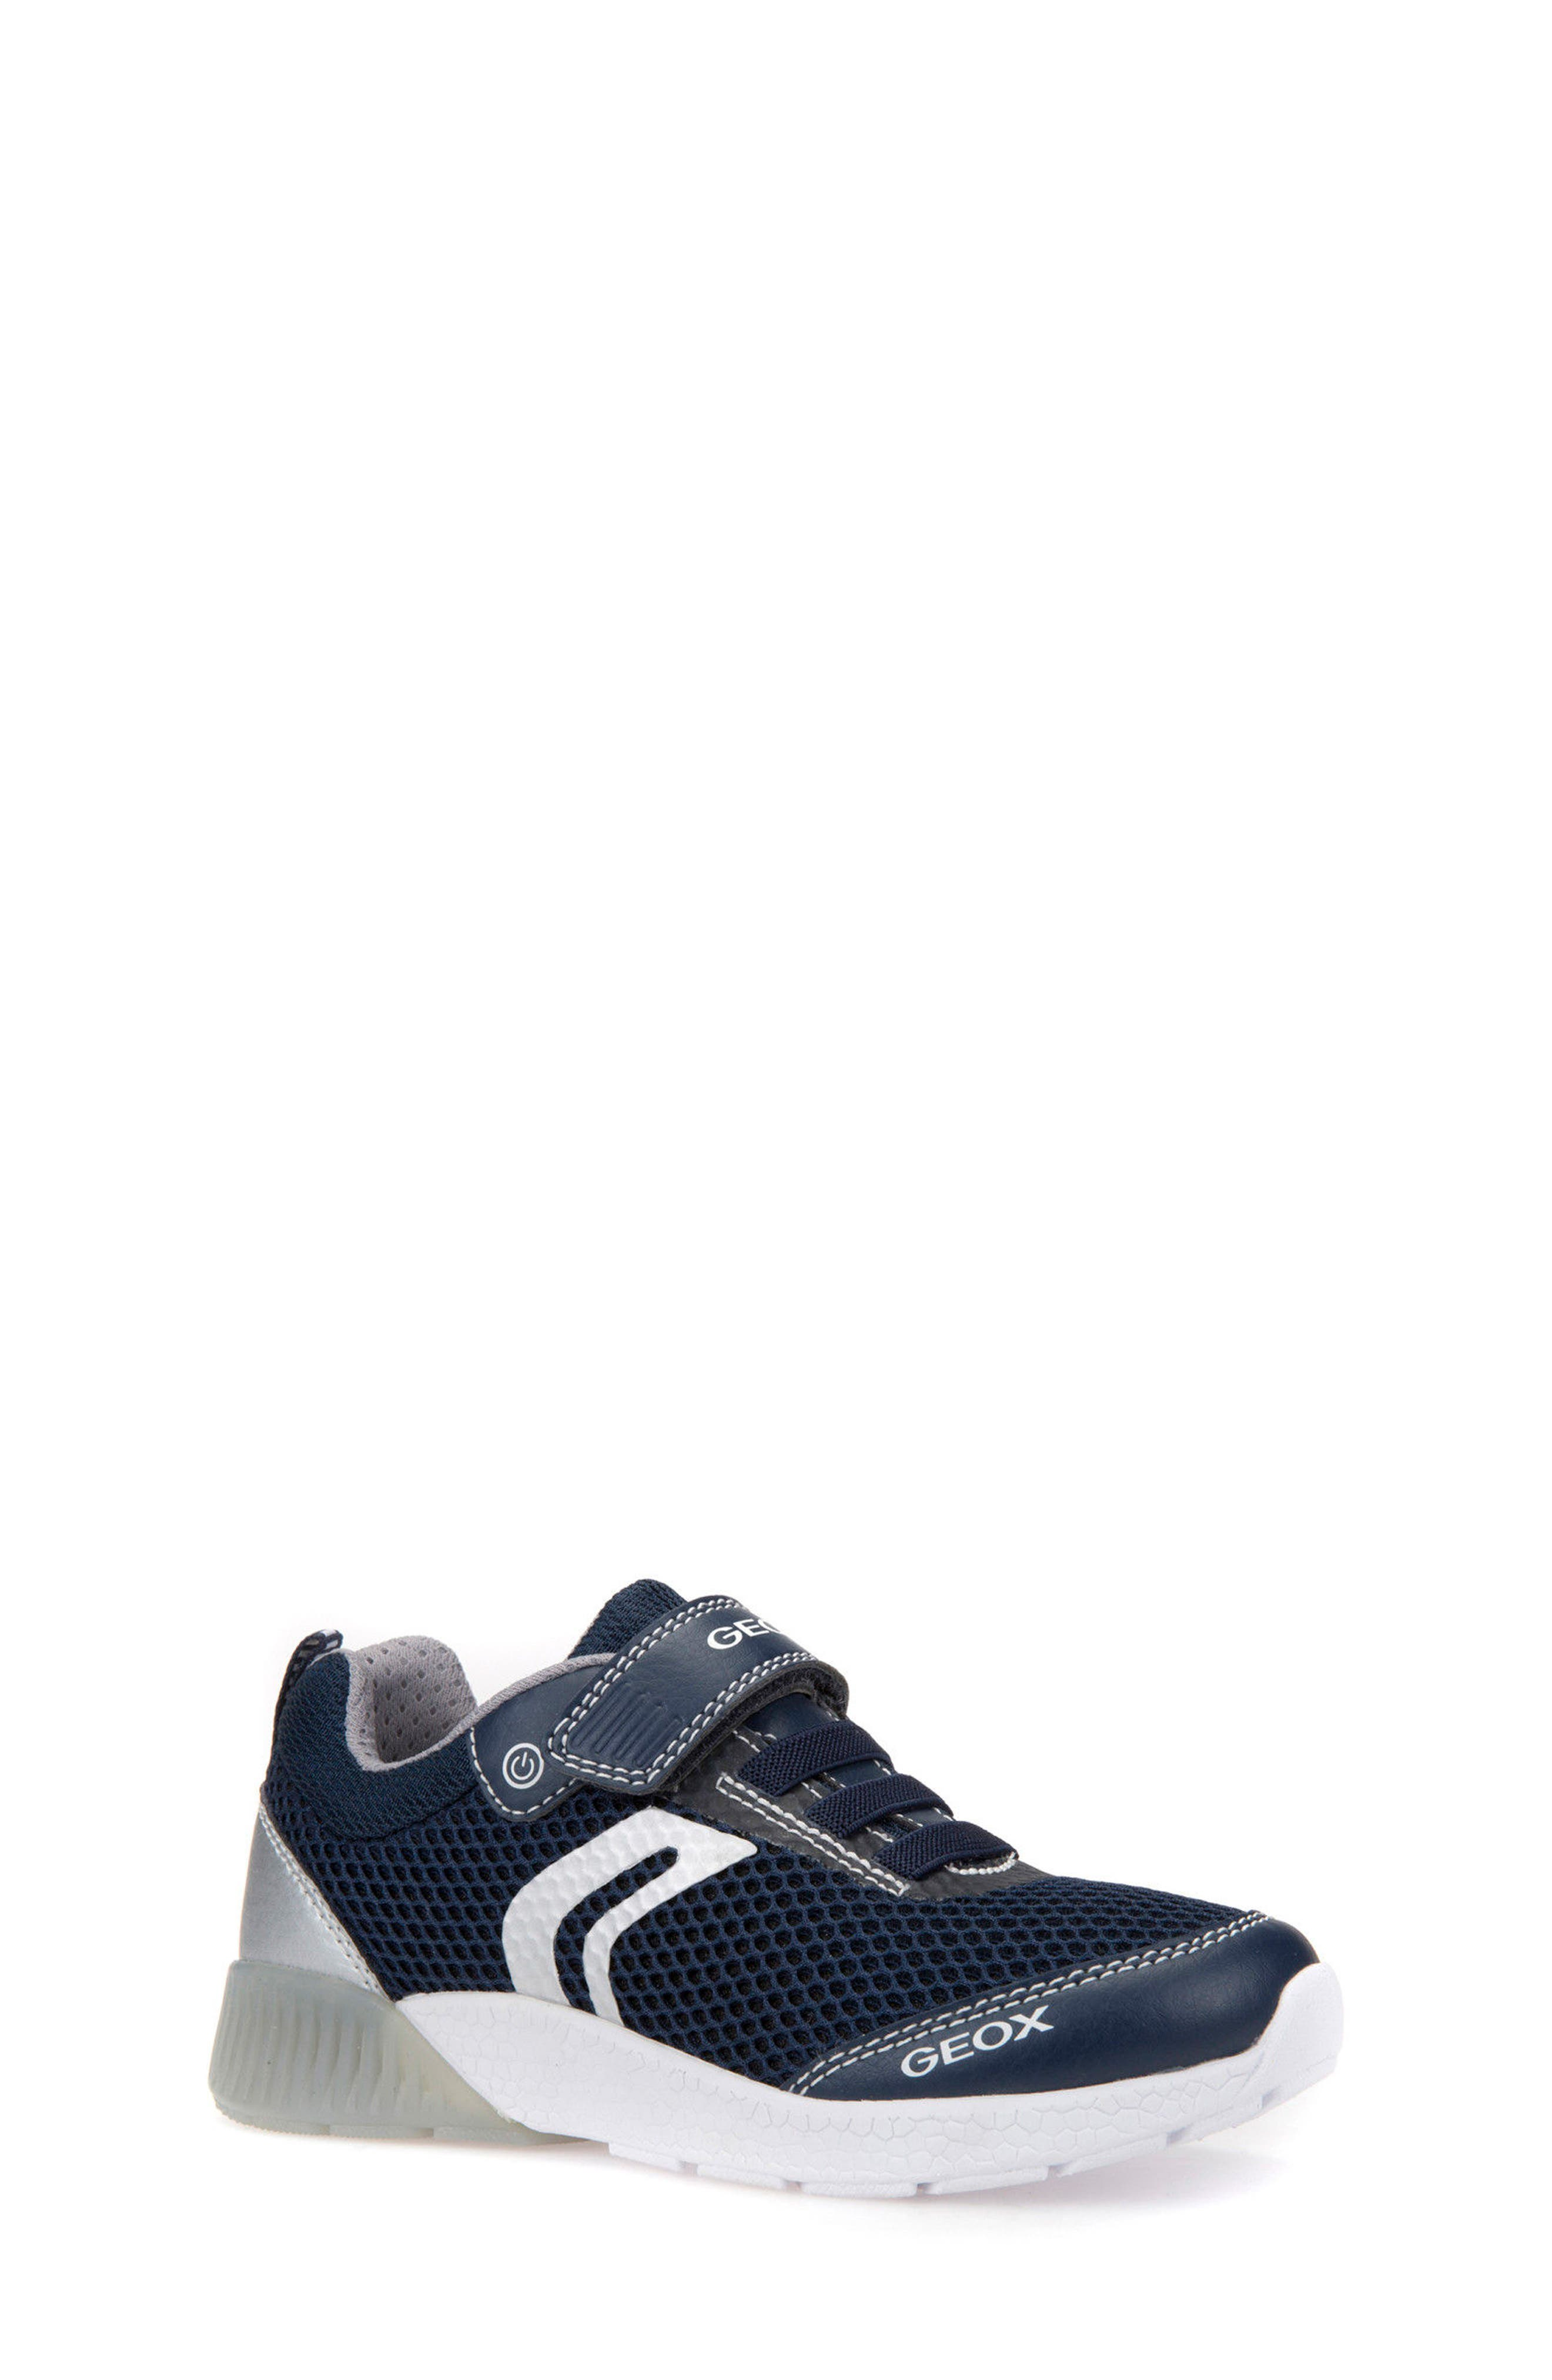 Sveth Light-Up Sneaker,                             Main thumbnail 1, color,                             NAVY/ SILVER